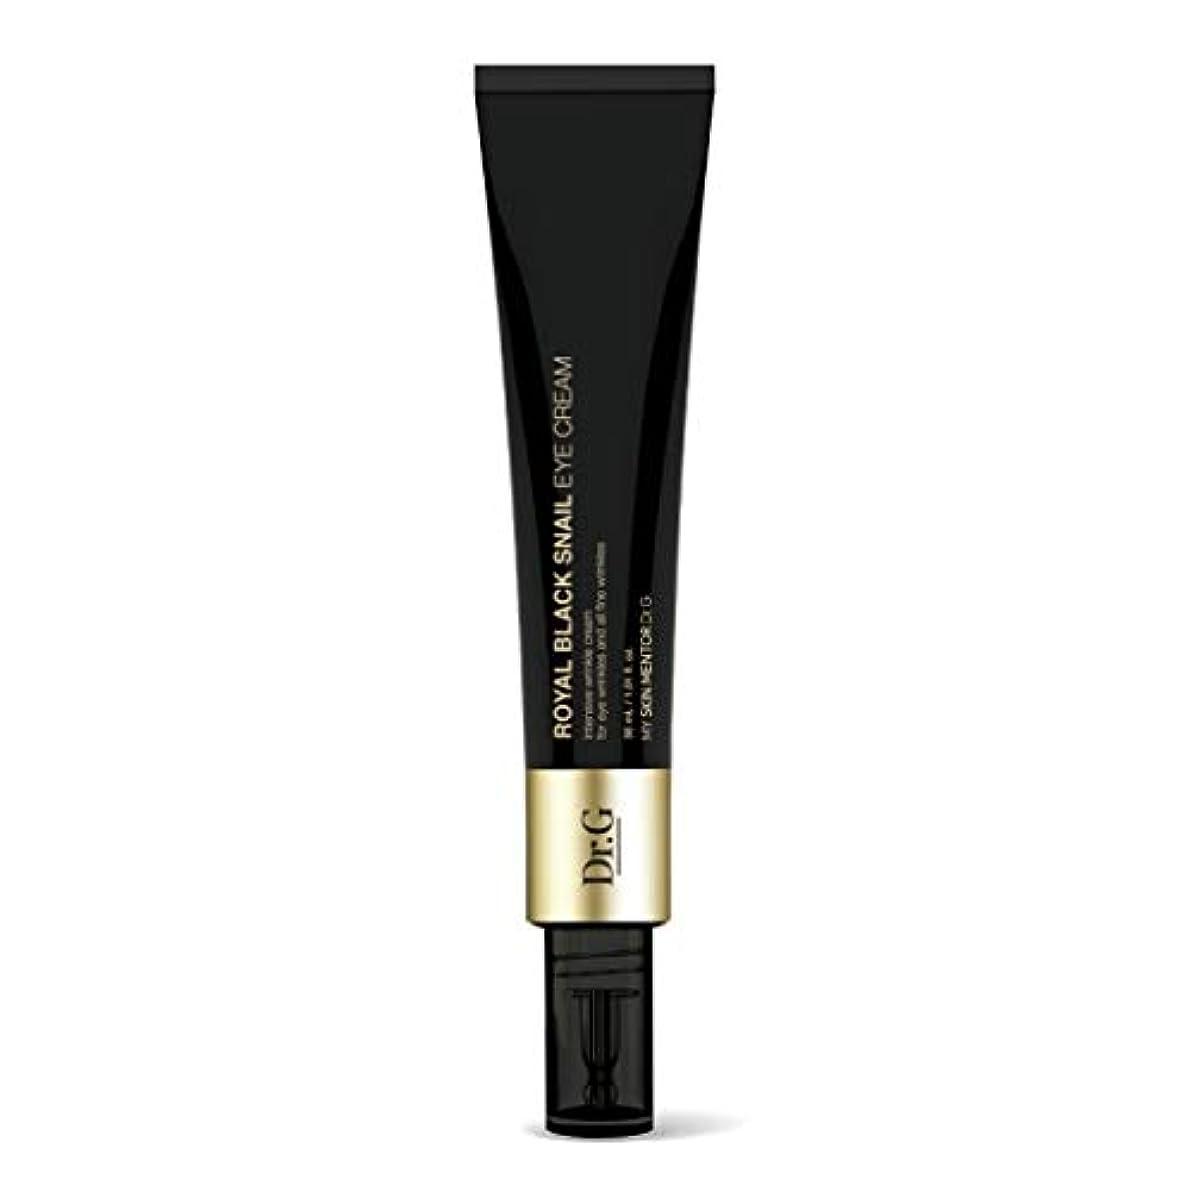 [Dr.Gドクタージー] ロイヤルブラックスネイルアイクリーム 30ml / Royal Black Snail Eye Cream